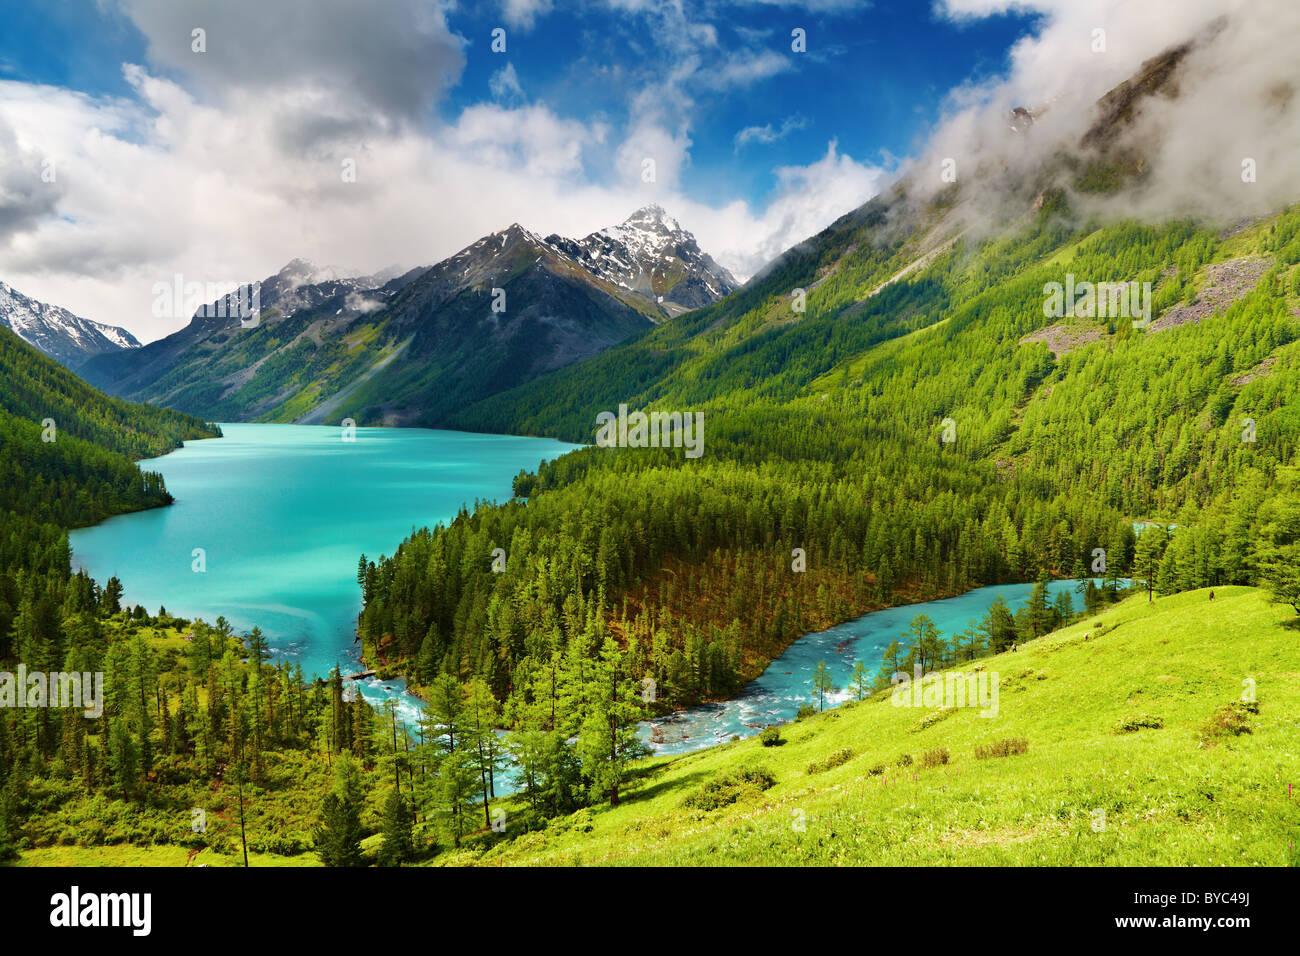 Beautiful turquoise lake Kucherlinskoe in Altai mountains - Stock Image